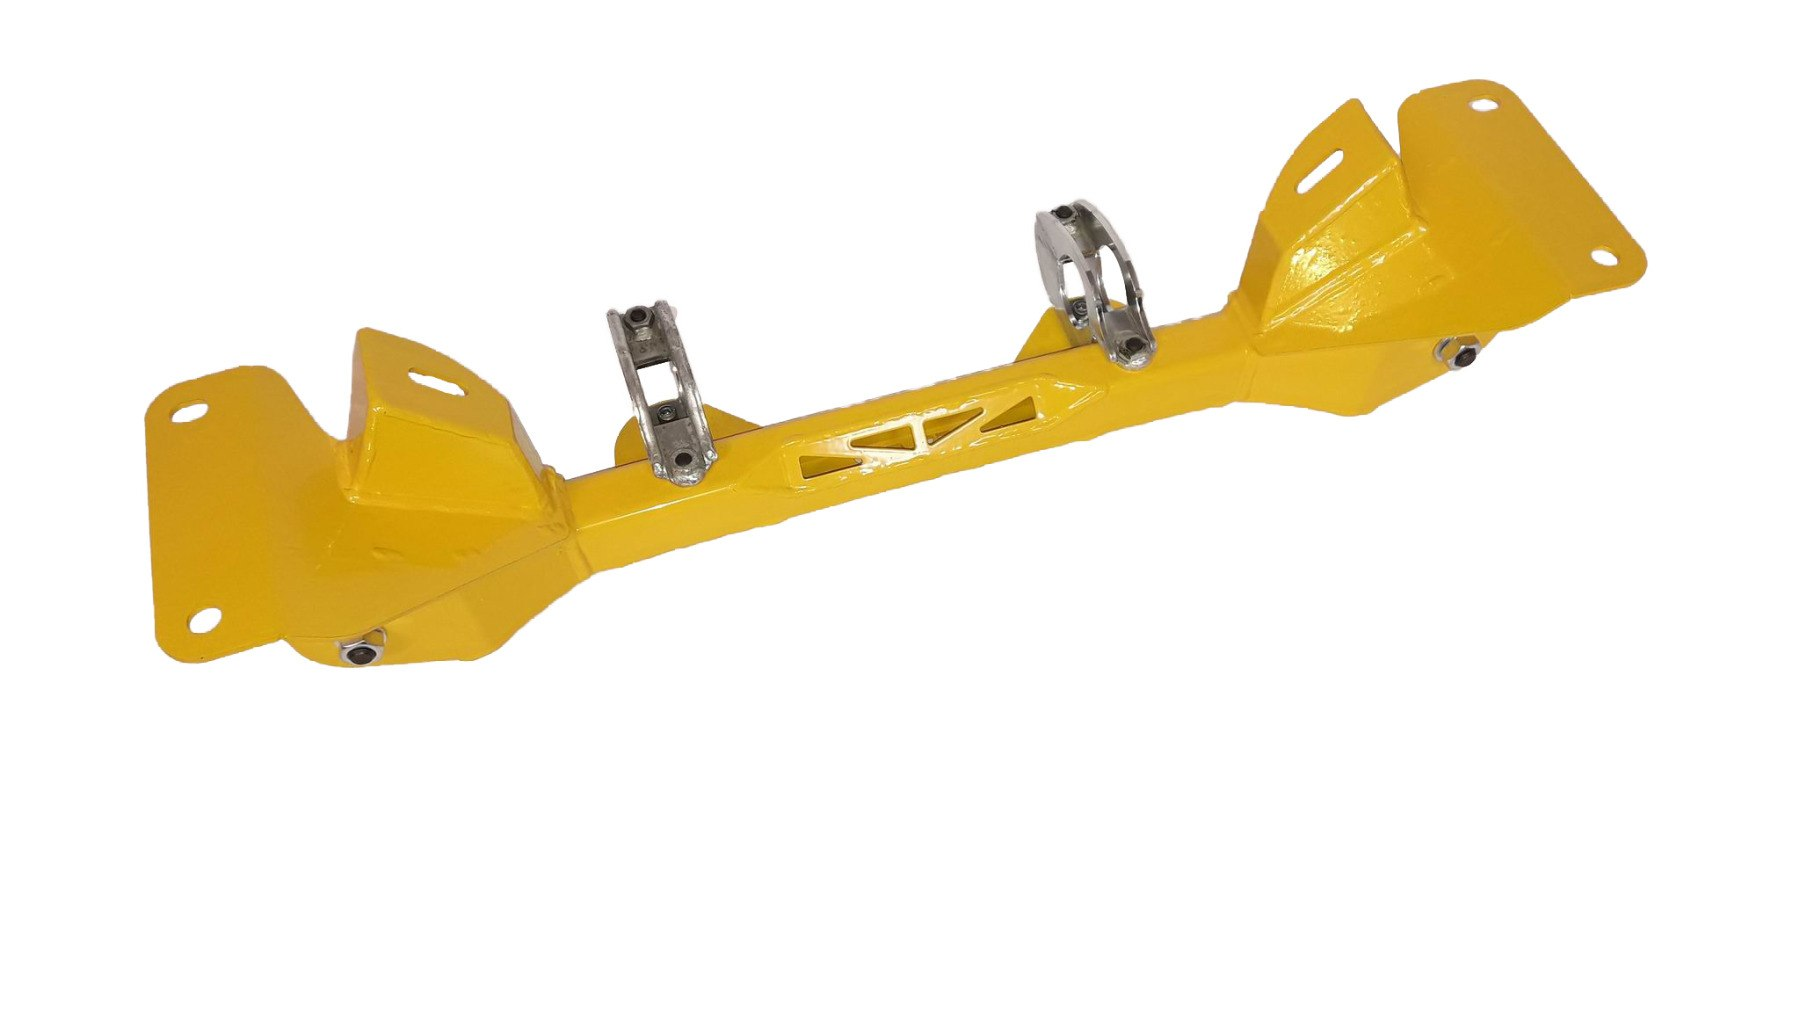 Zestaw skrętu Nissan S14/S15 IDC/BDC Legal FAT - GRUBYGARAGE - Sklep Tuningowy